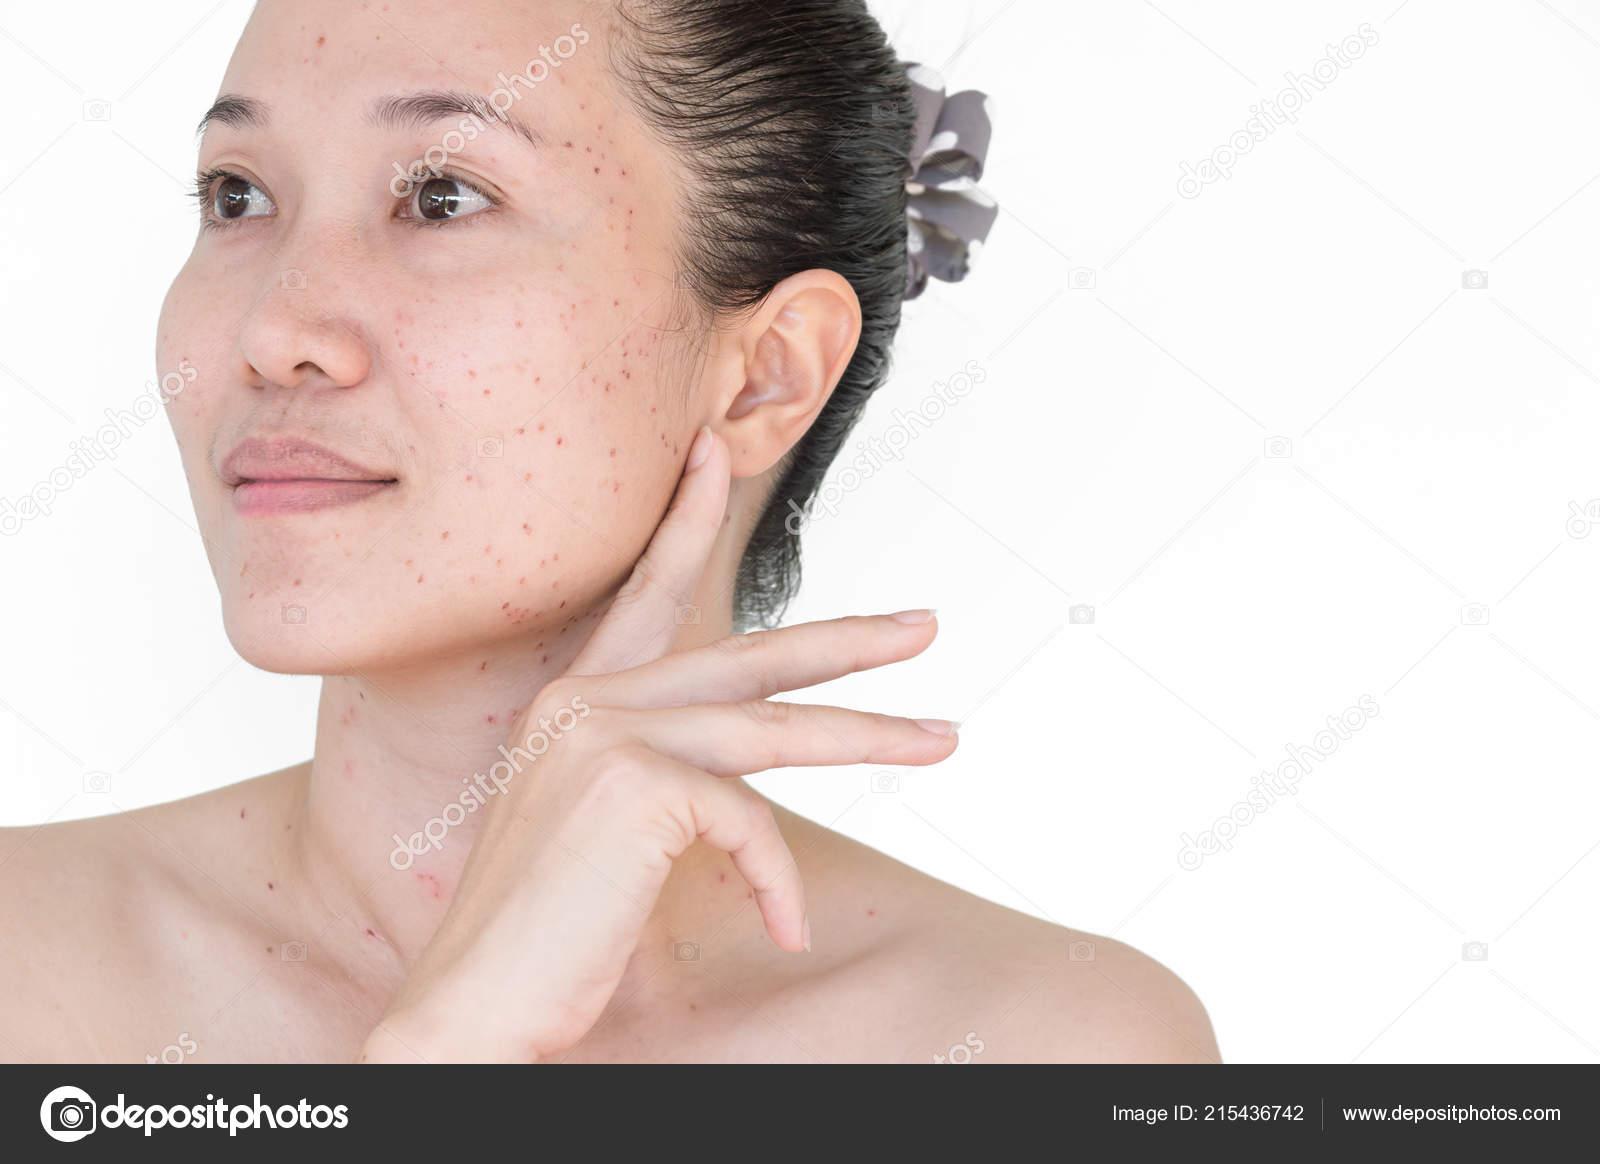 Pics: dark spots on face | Burn Spots Scabs Laser Treatment